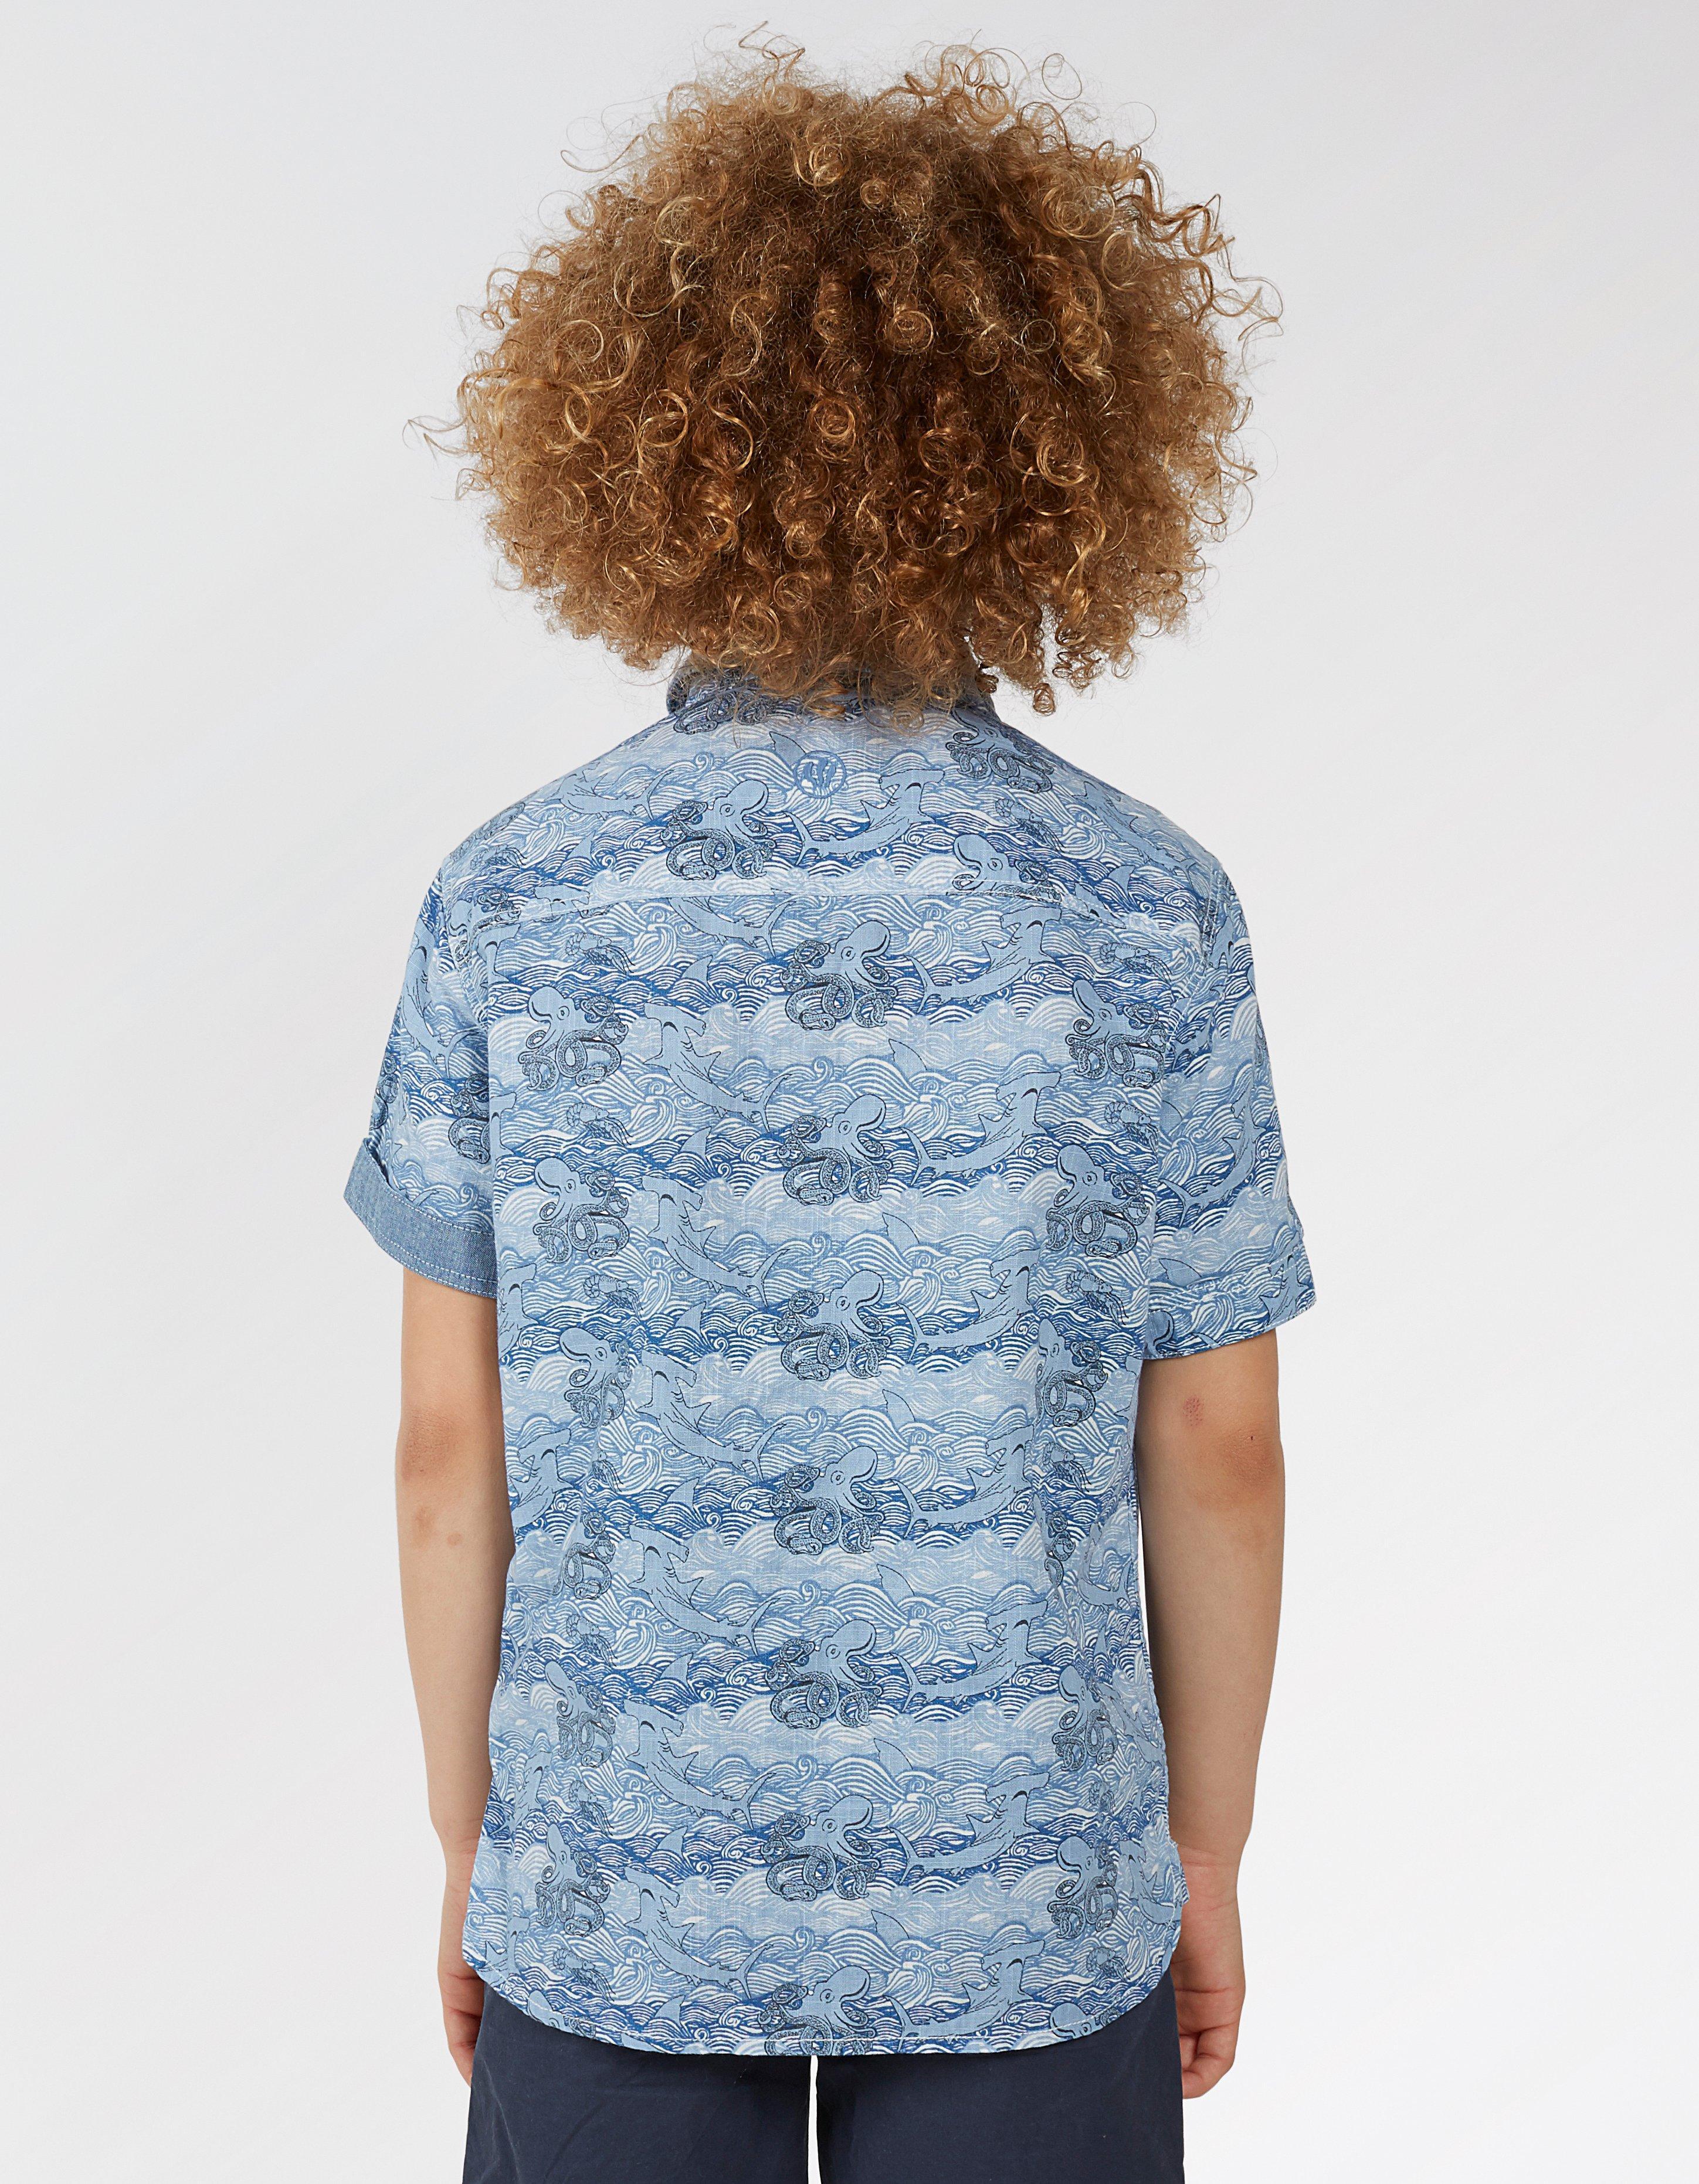 Stormy Seas Print Shirt